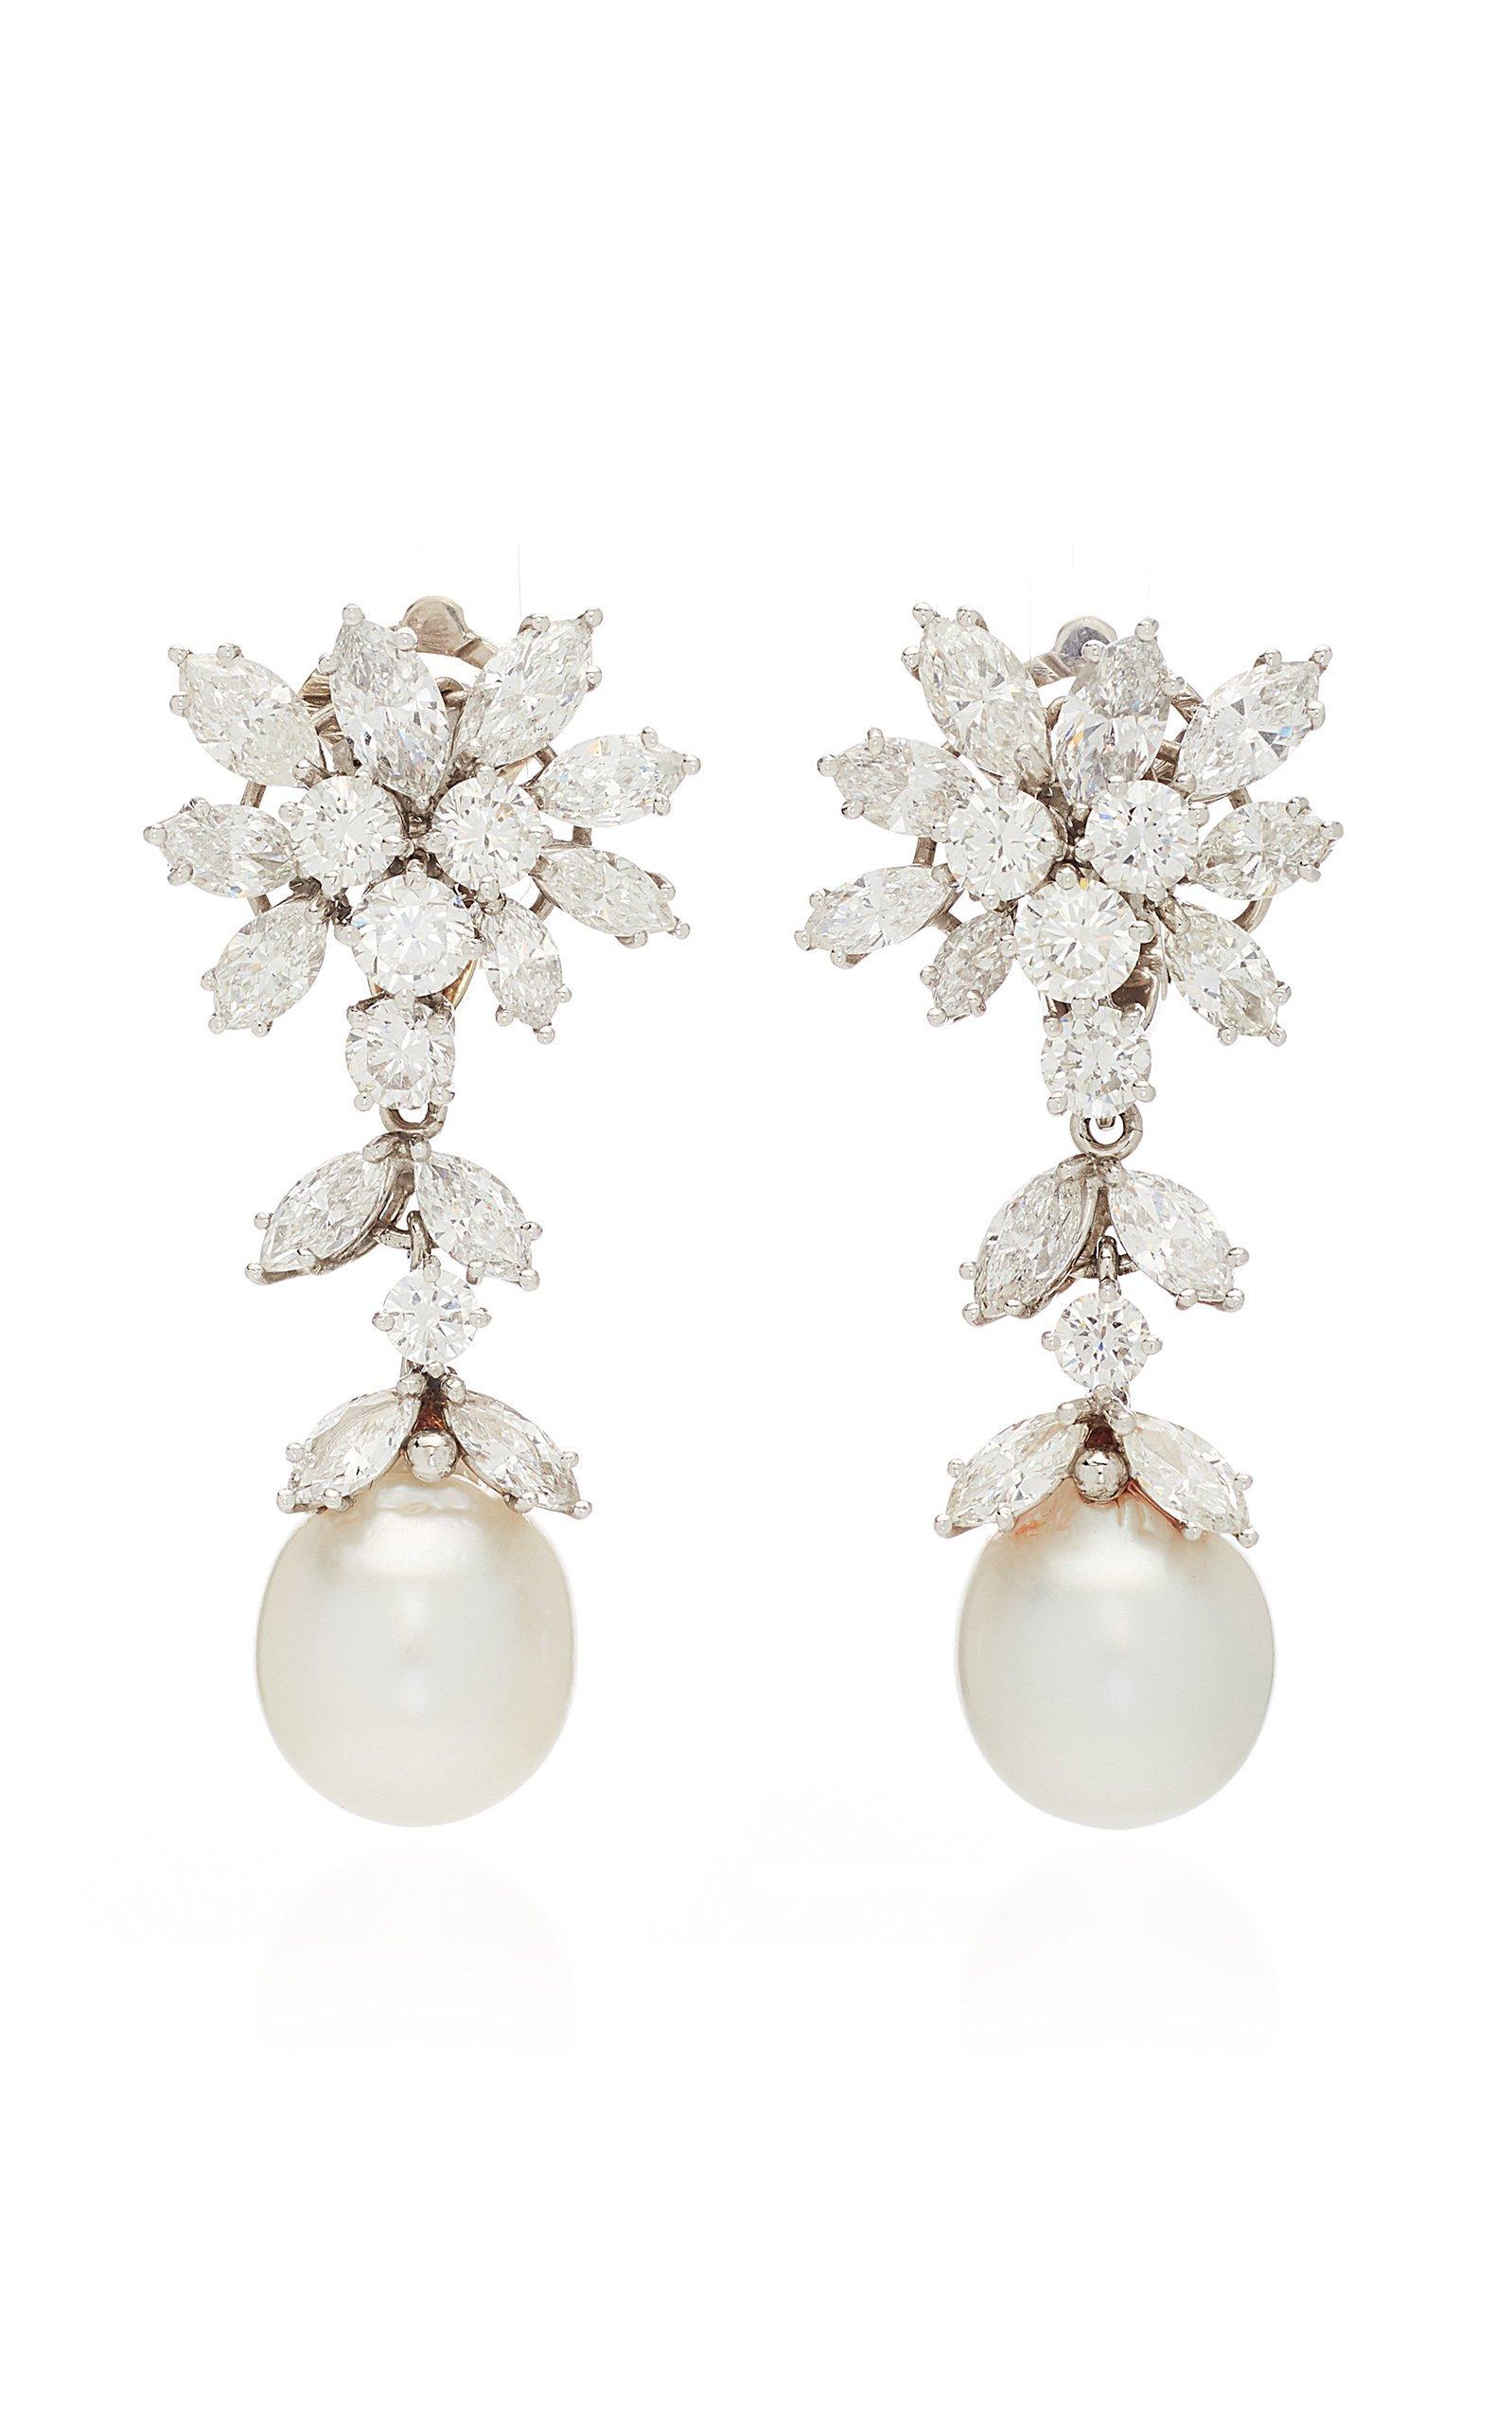 Simon Teakle Cultured Pearl & Diamond Earrings